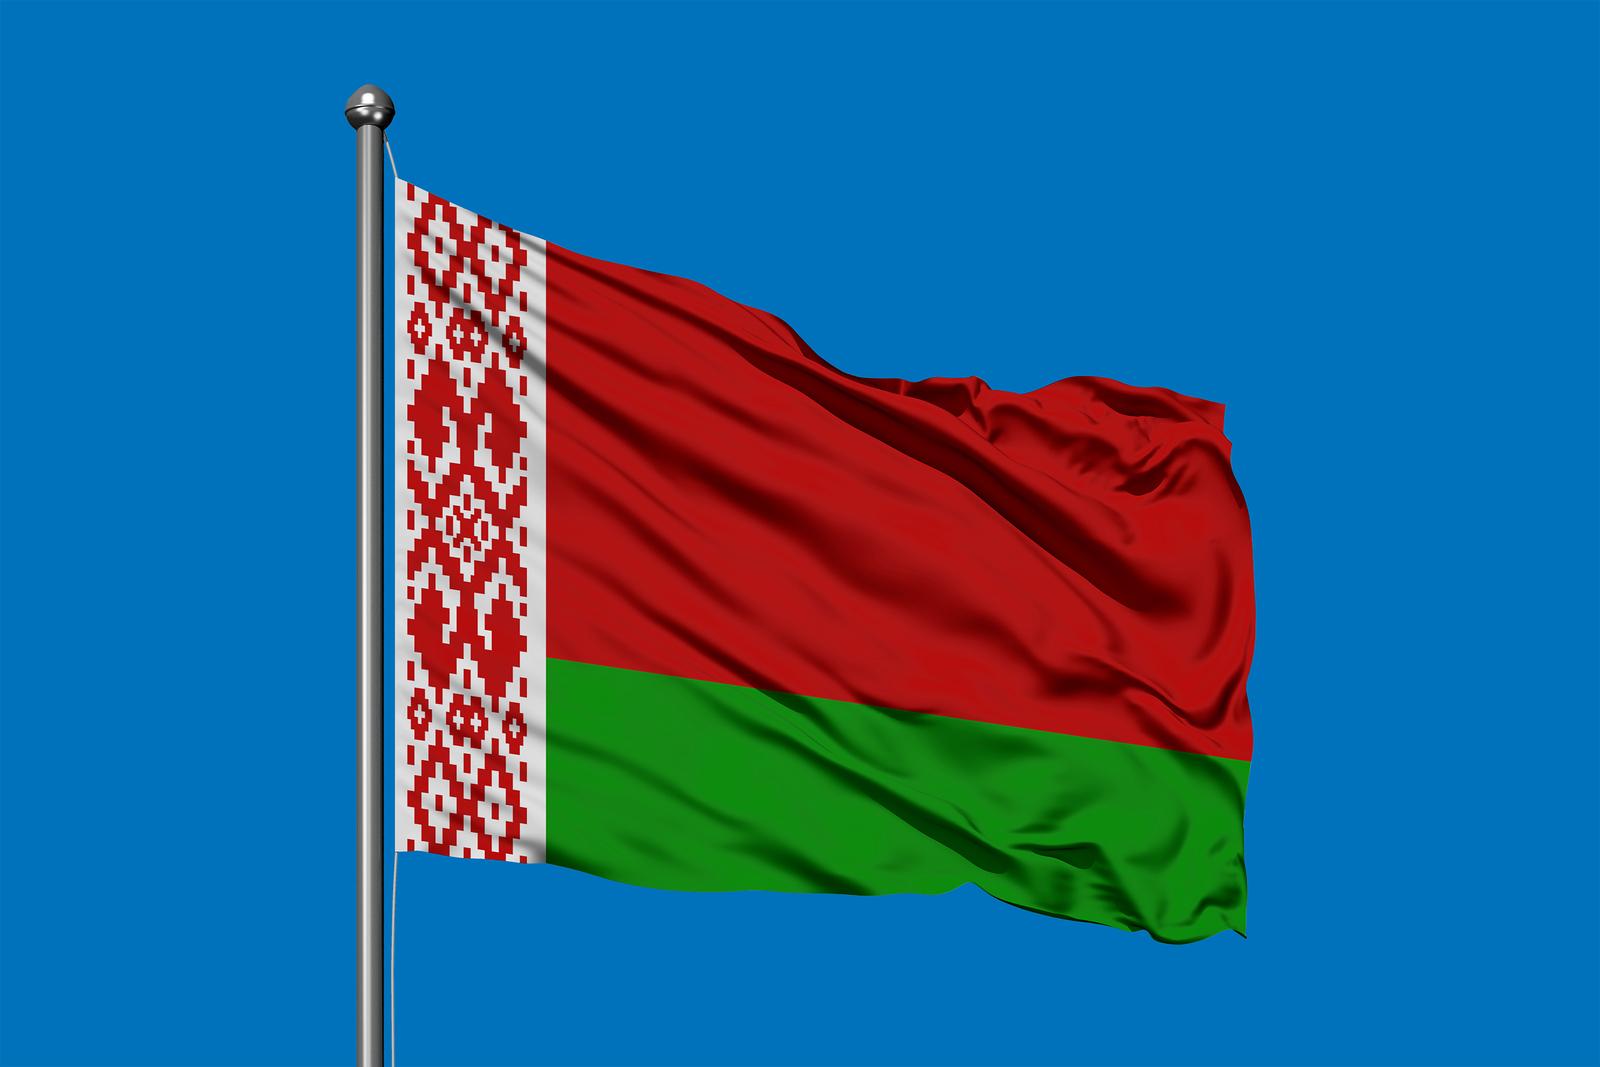 bigstock-Flag-Of-Belarus-Waving-In-The–272022583